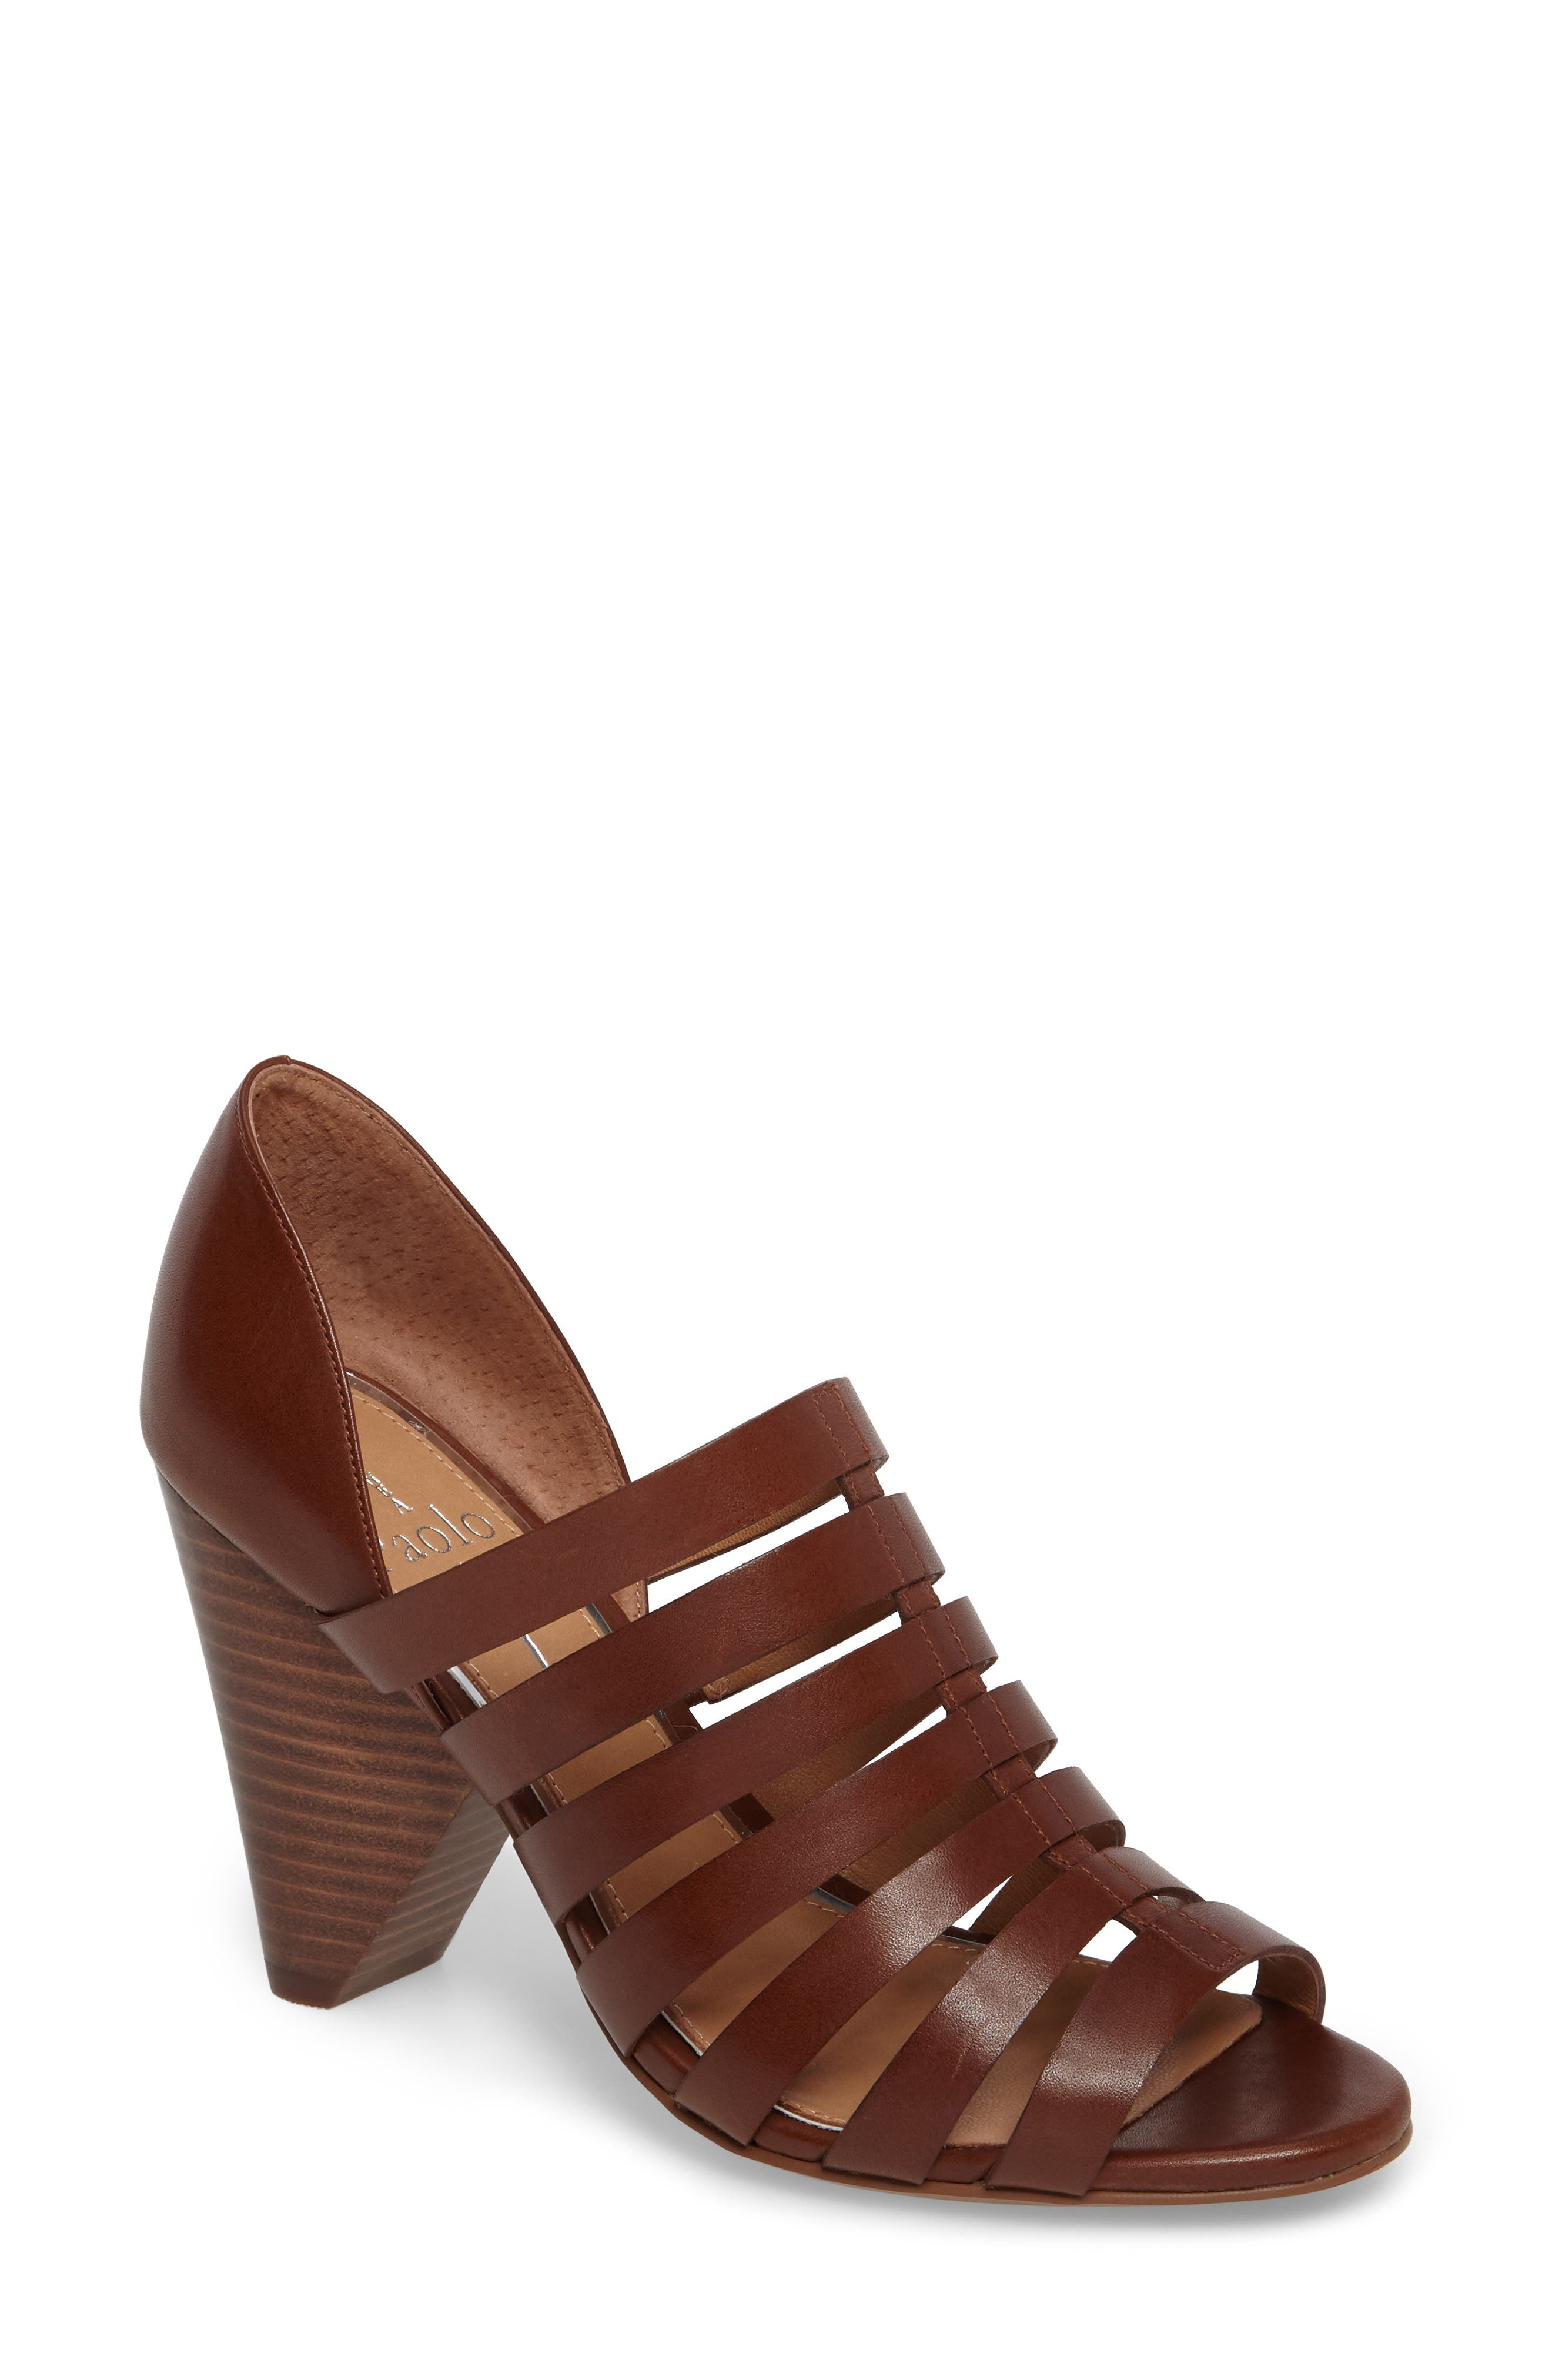 Main Image - Linea Paolo Pierce Chisel Heel Cage Sandal (Women)